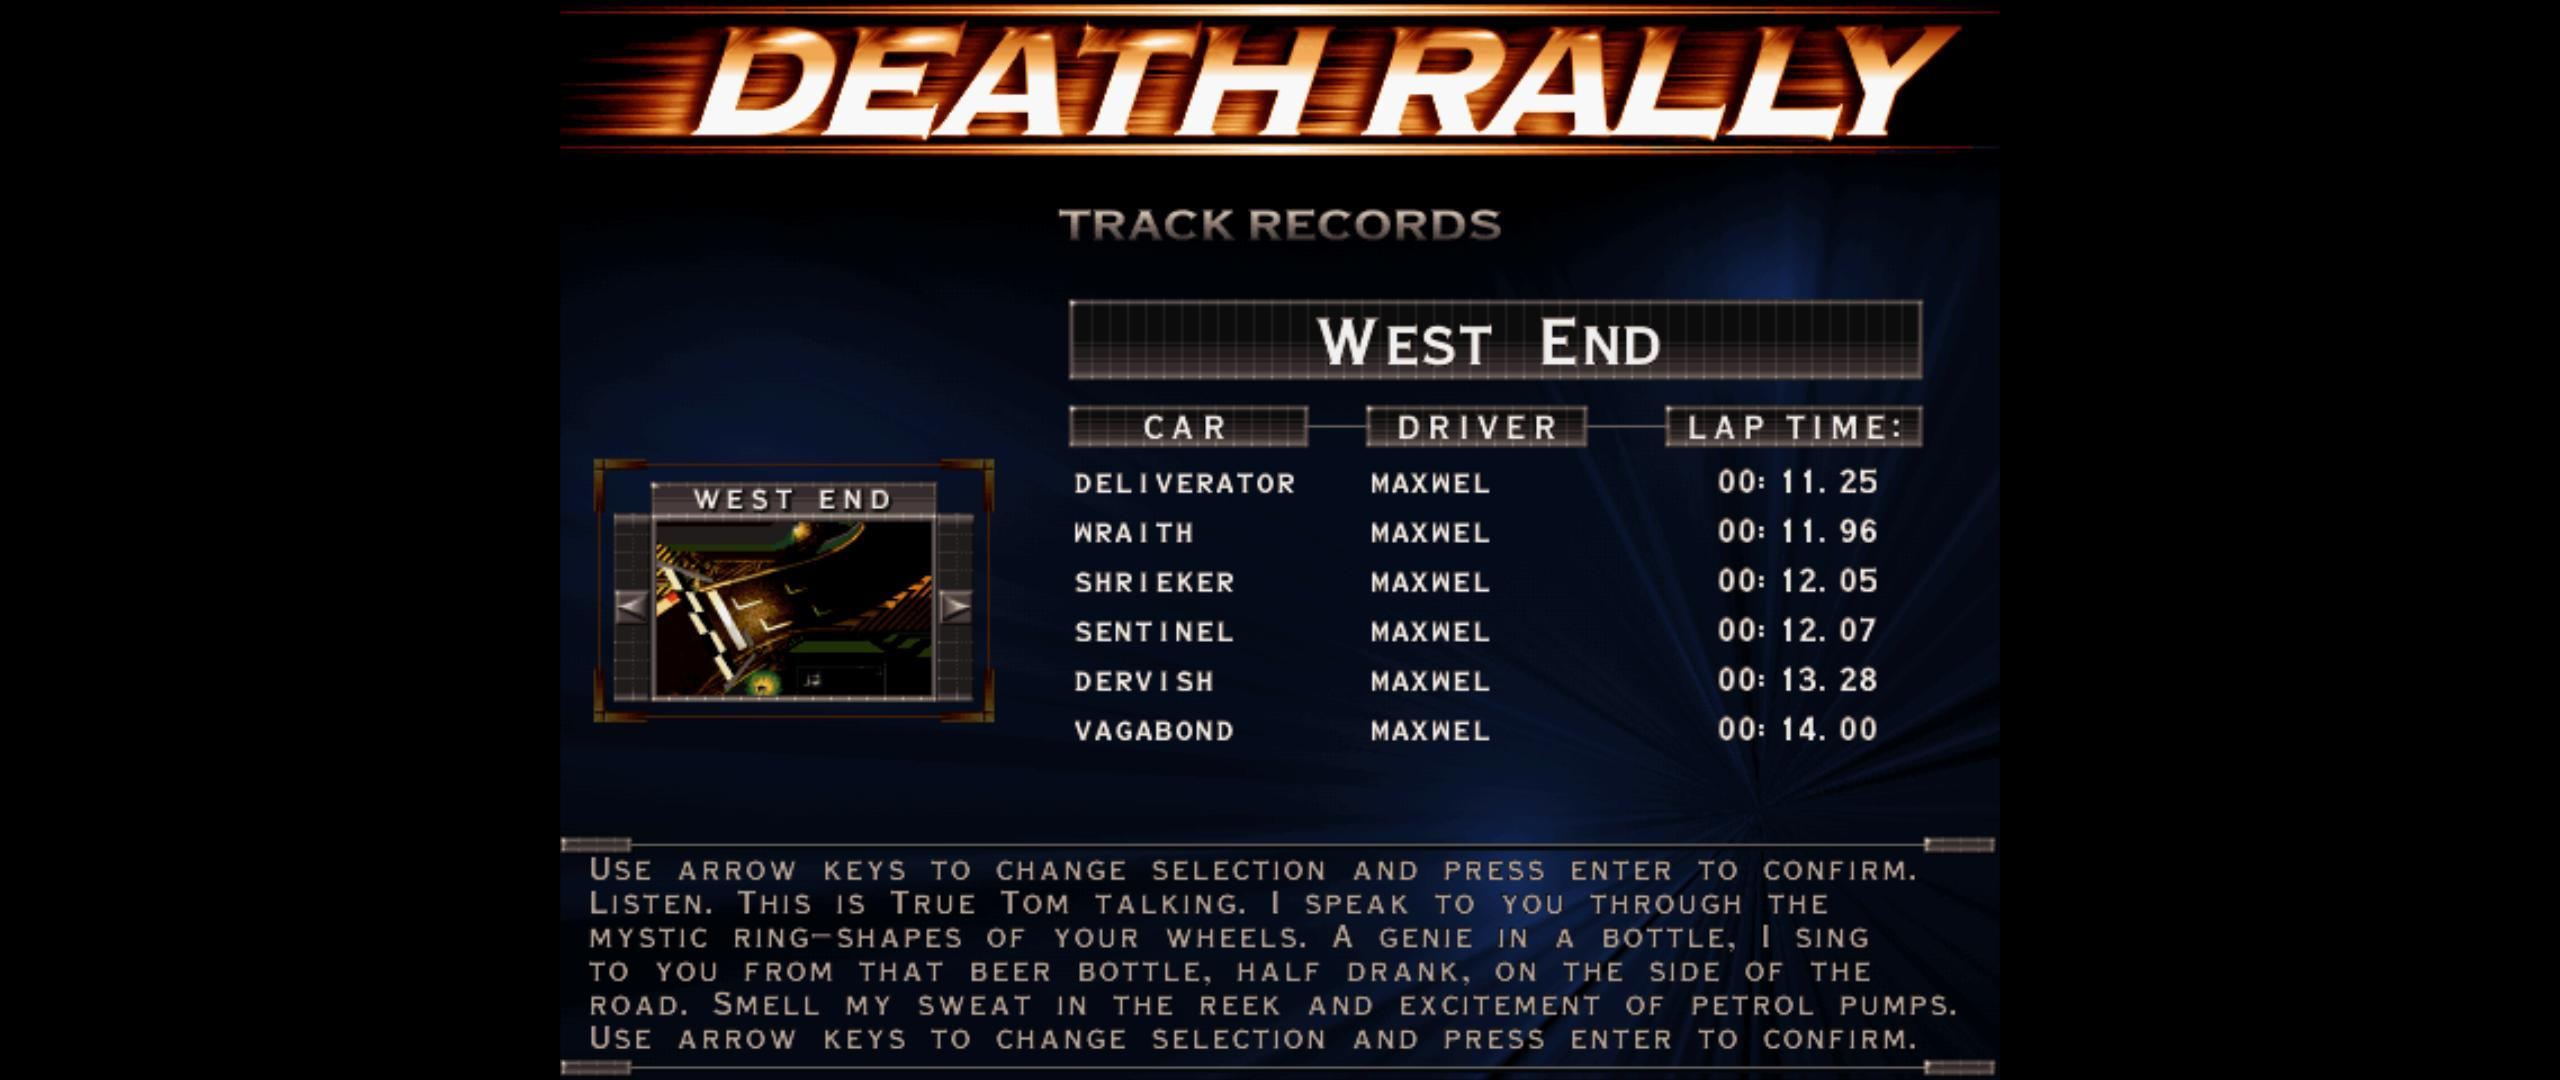 Maxwel: Death Rally [West End, Vagabond Car] (PC) 0:00:14 points on 2016-03-04 05:41:48